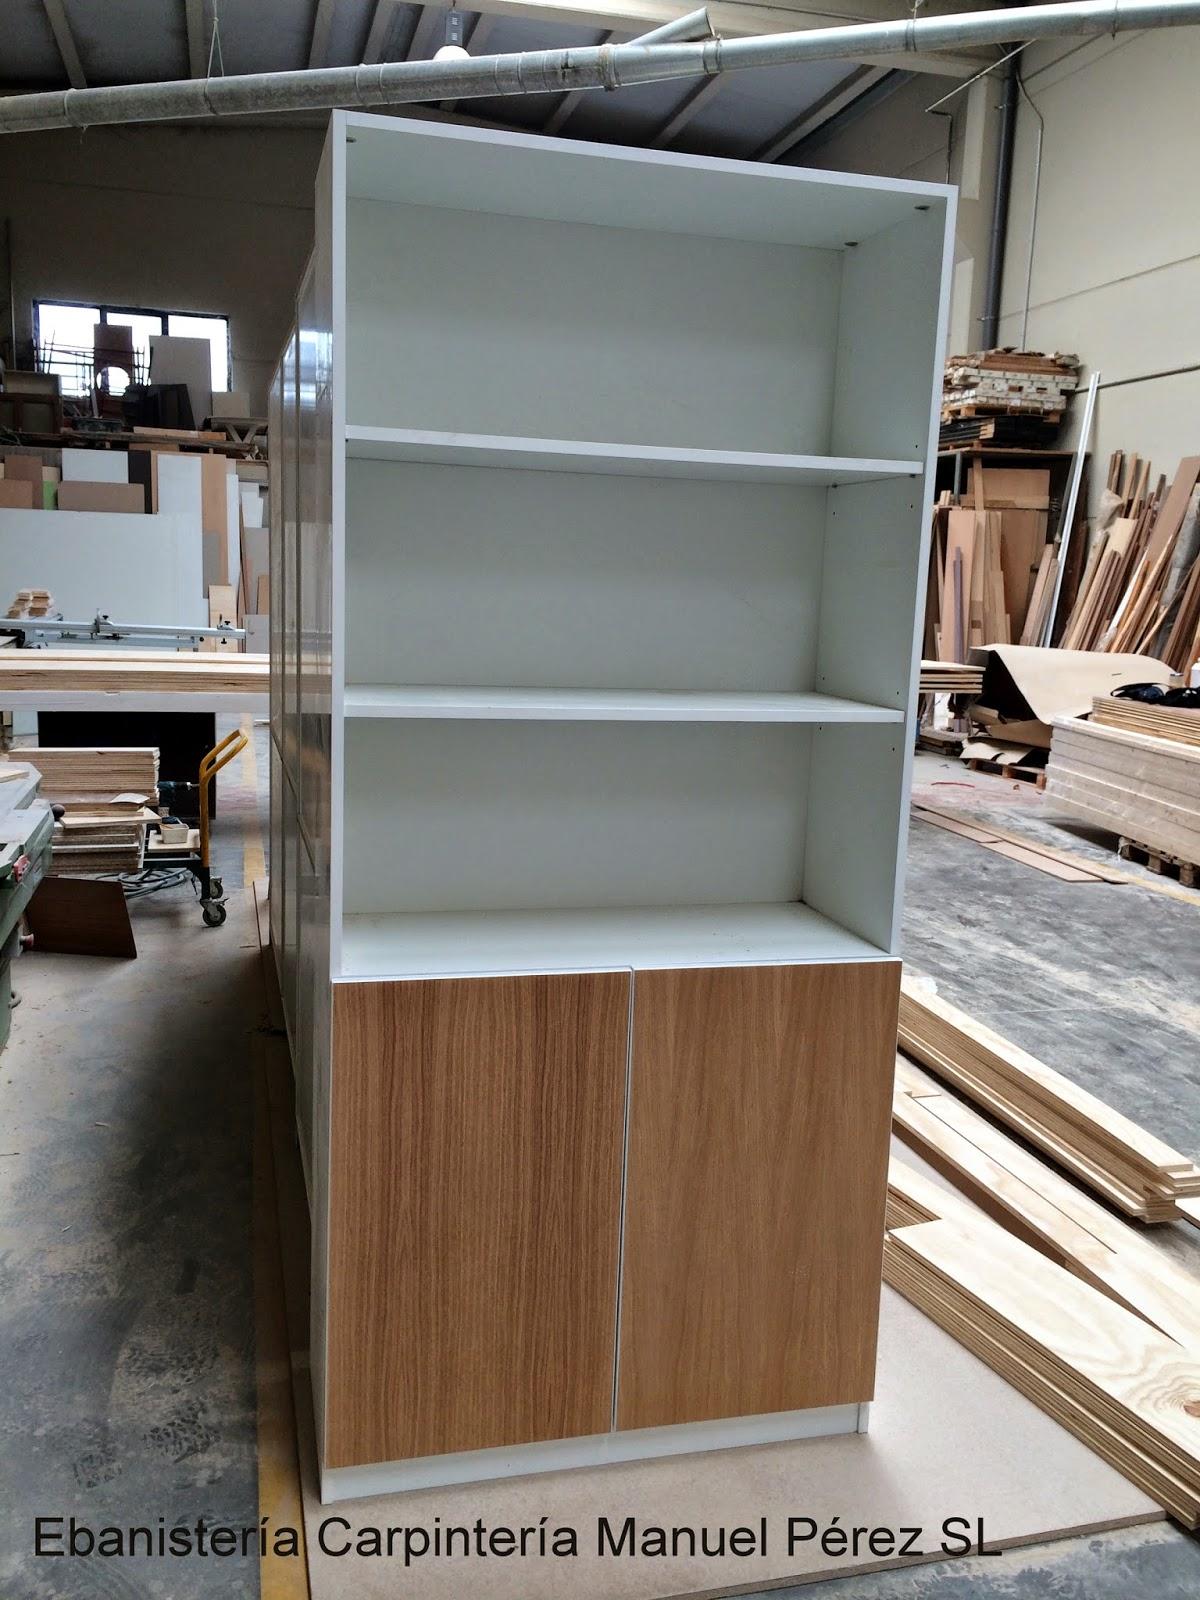 Ebanisteria carpinteria manuel perez zaragoza mueble for Mueble archivador oficina